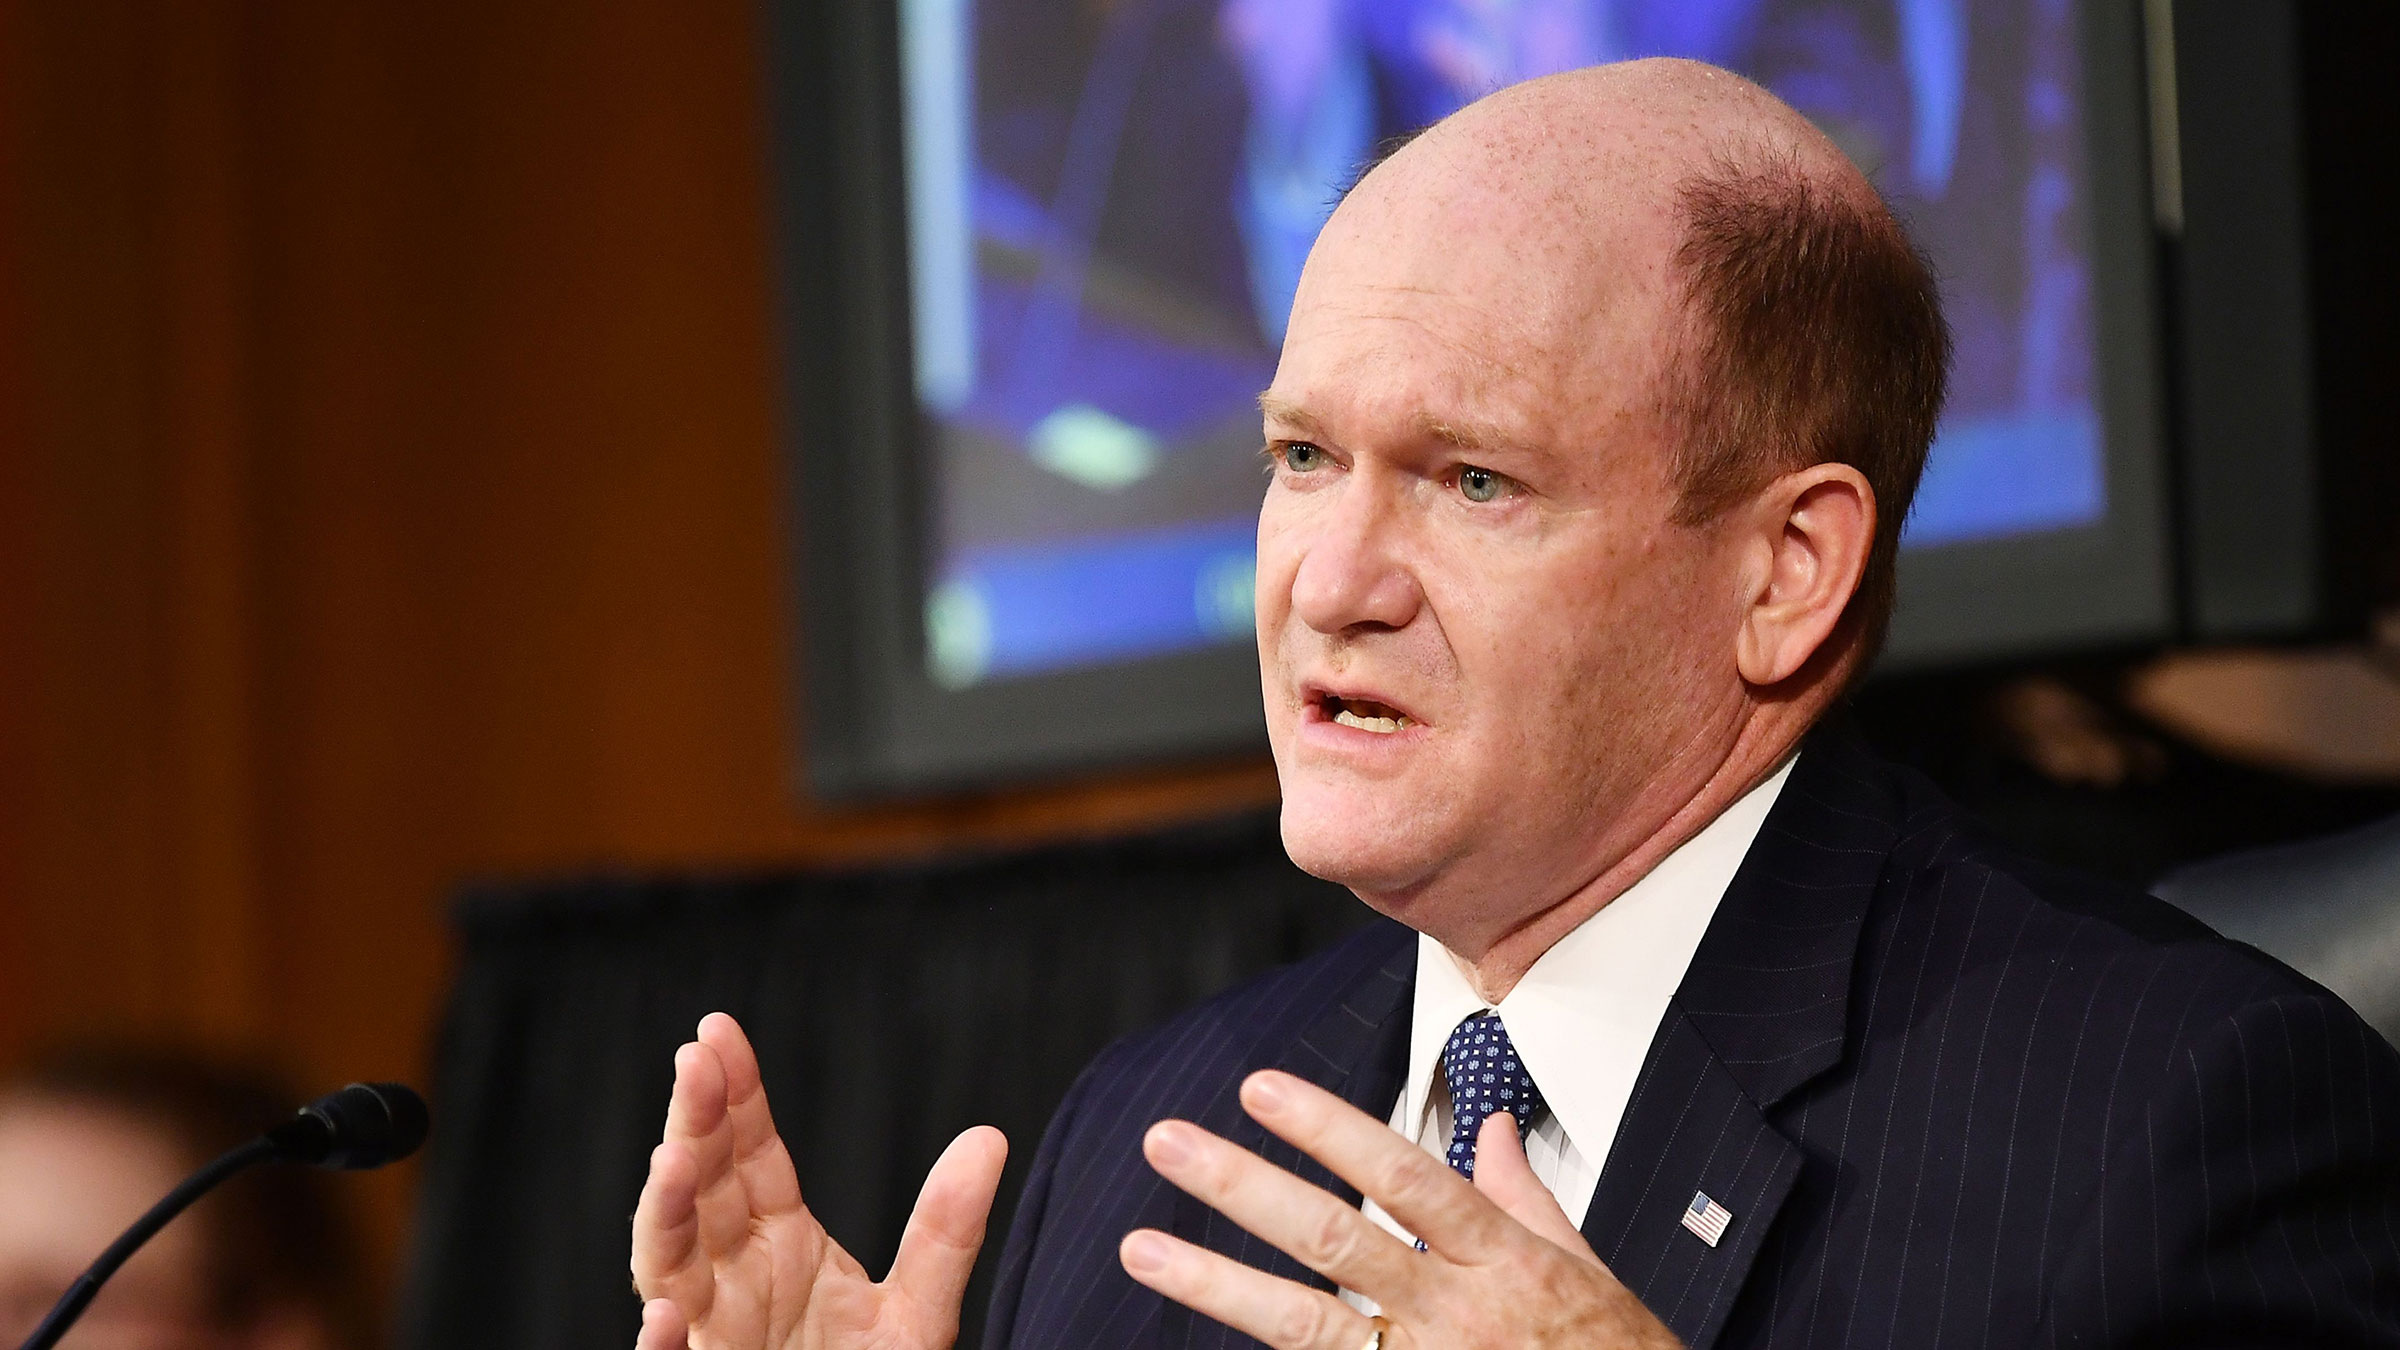 Senator Chris Coons testifies before the Senate Judiciary Committee on October 15, 2020 in Washington, DC.